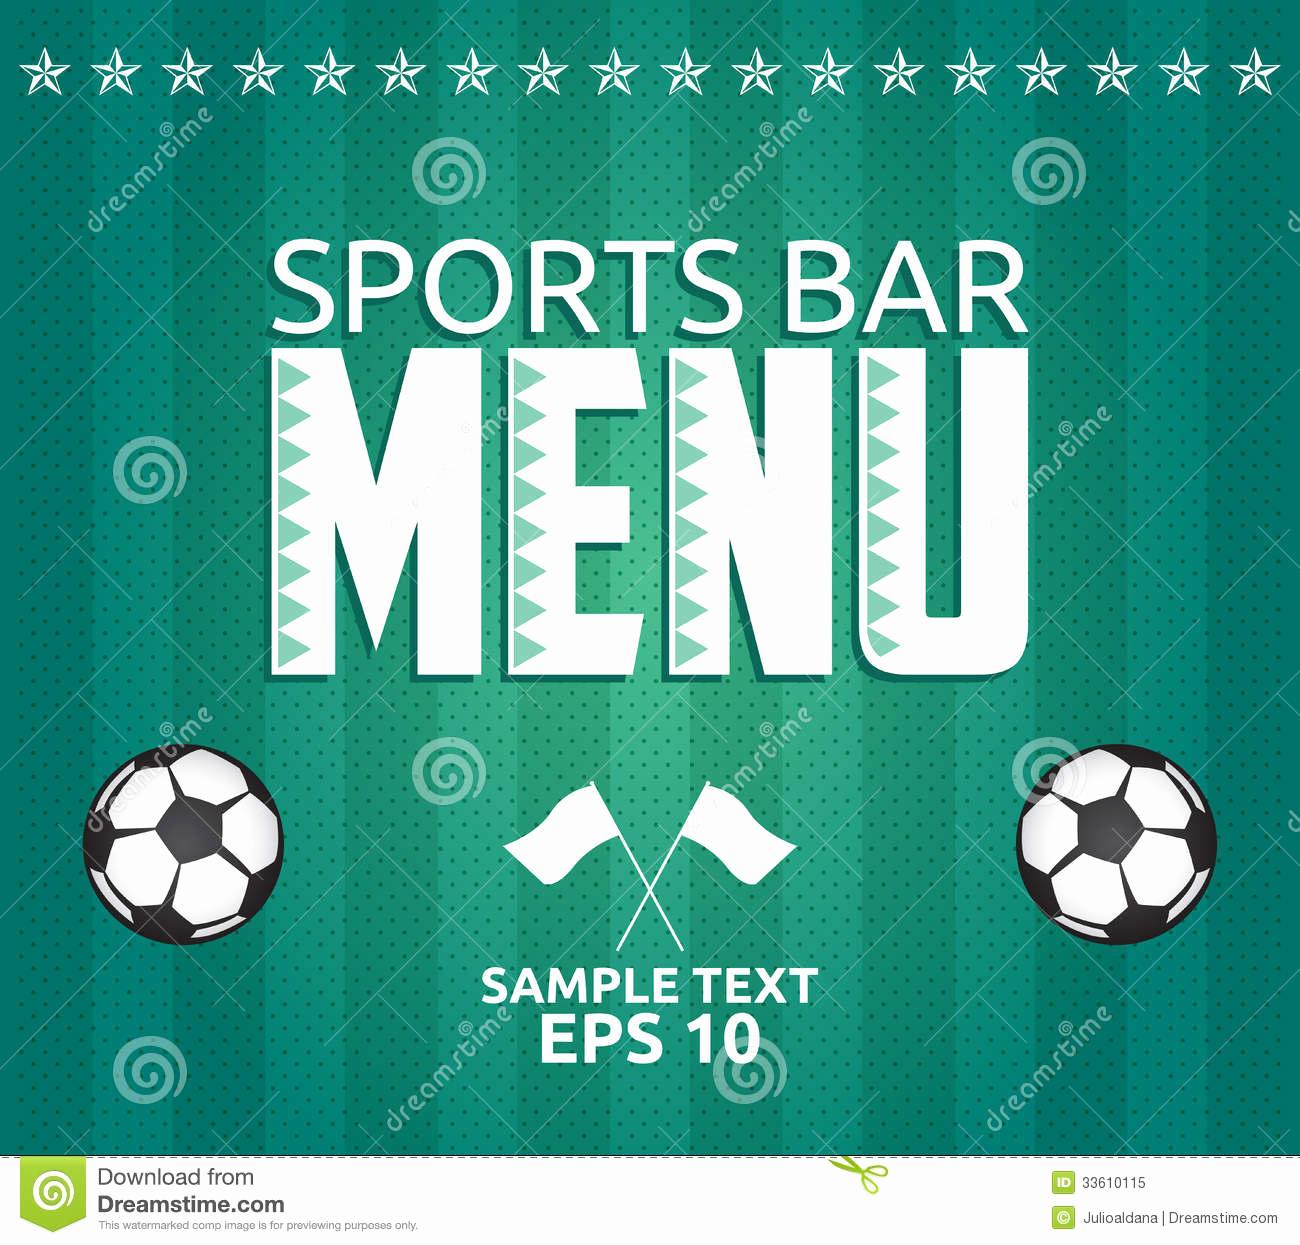 Sports Bar Menu Template Unique Football Sports Bar Menu Card Design Template Royalty